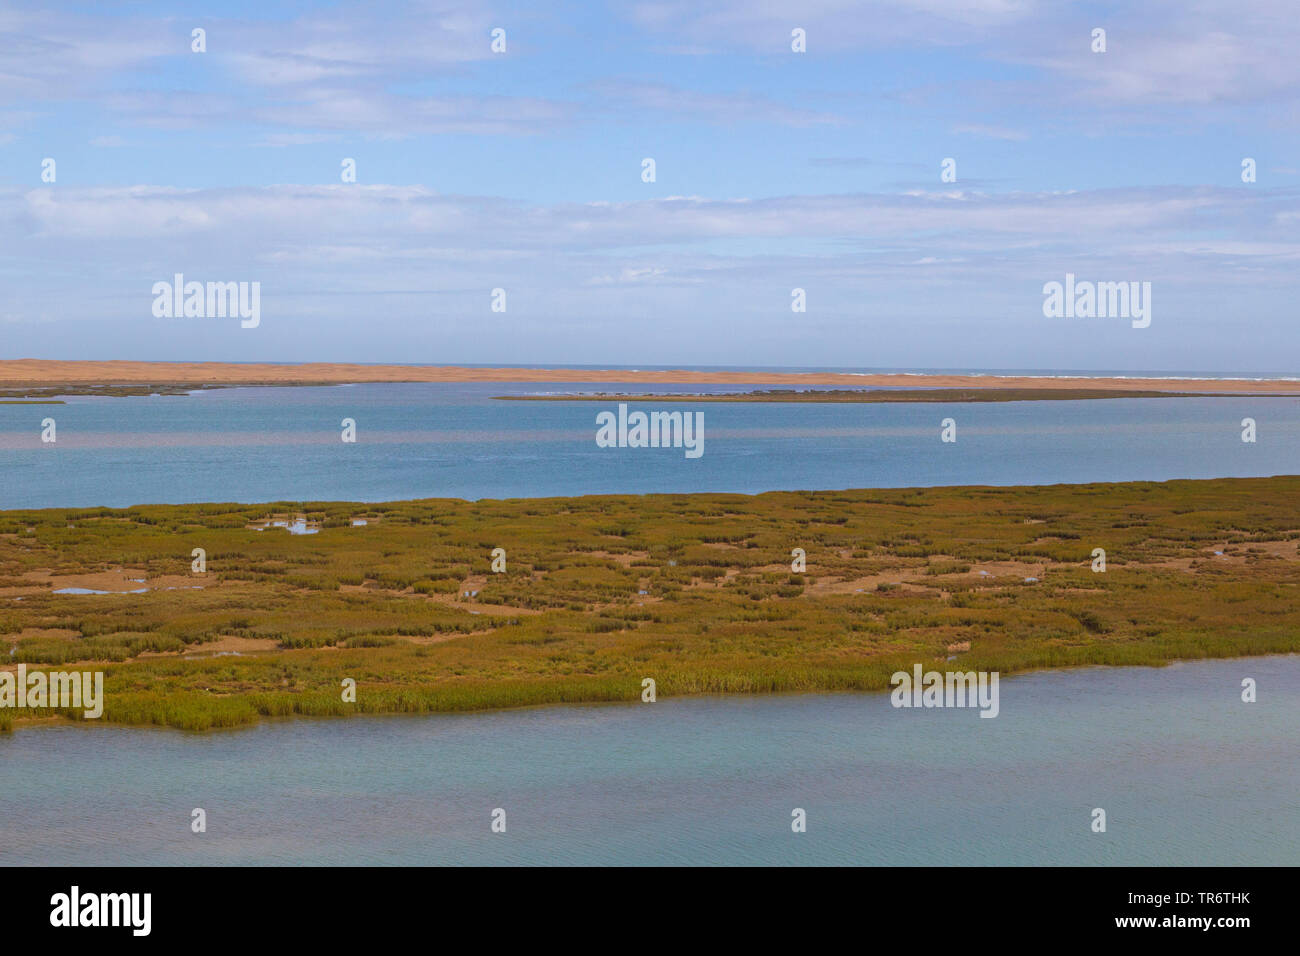 landscape in Khenifiss National park, Morocco, Western Sahara, Khenifiss National Park Stock Photo